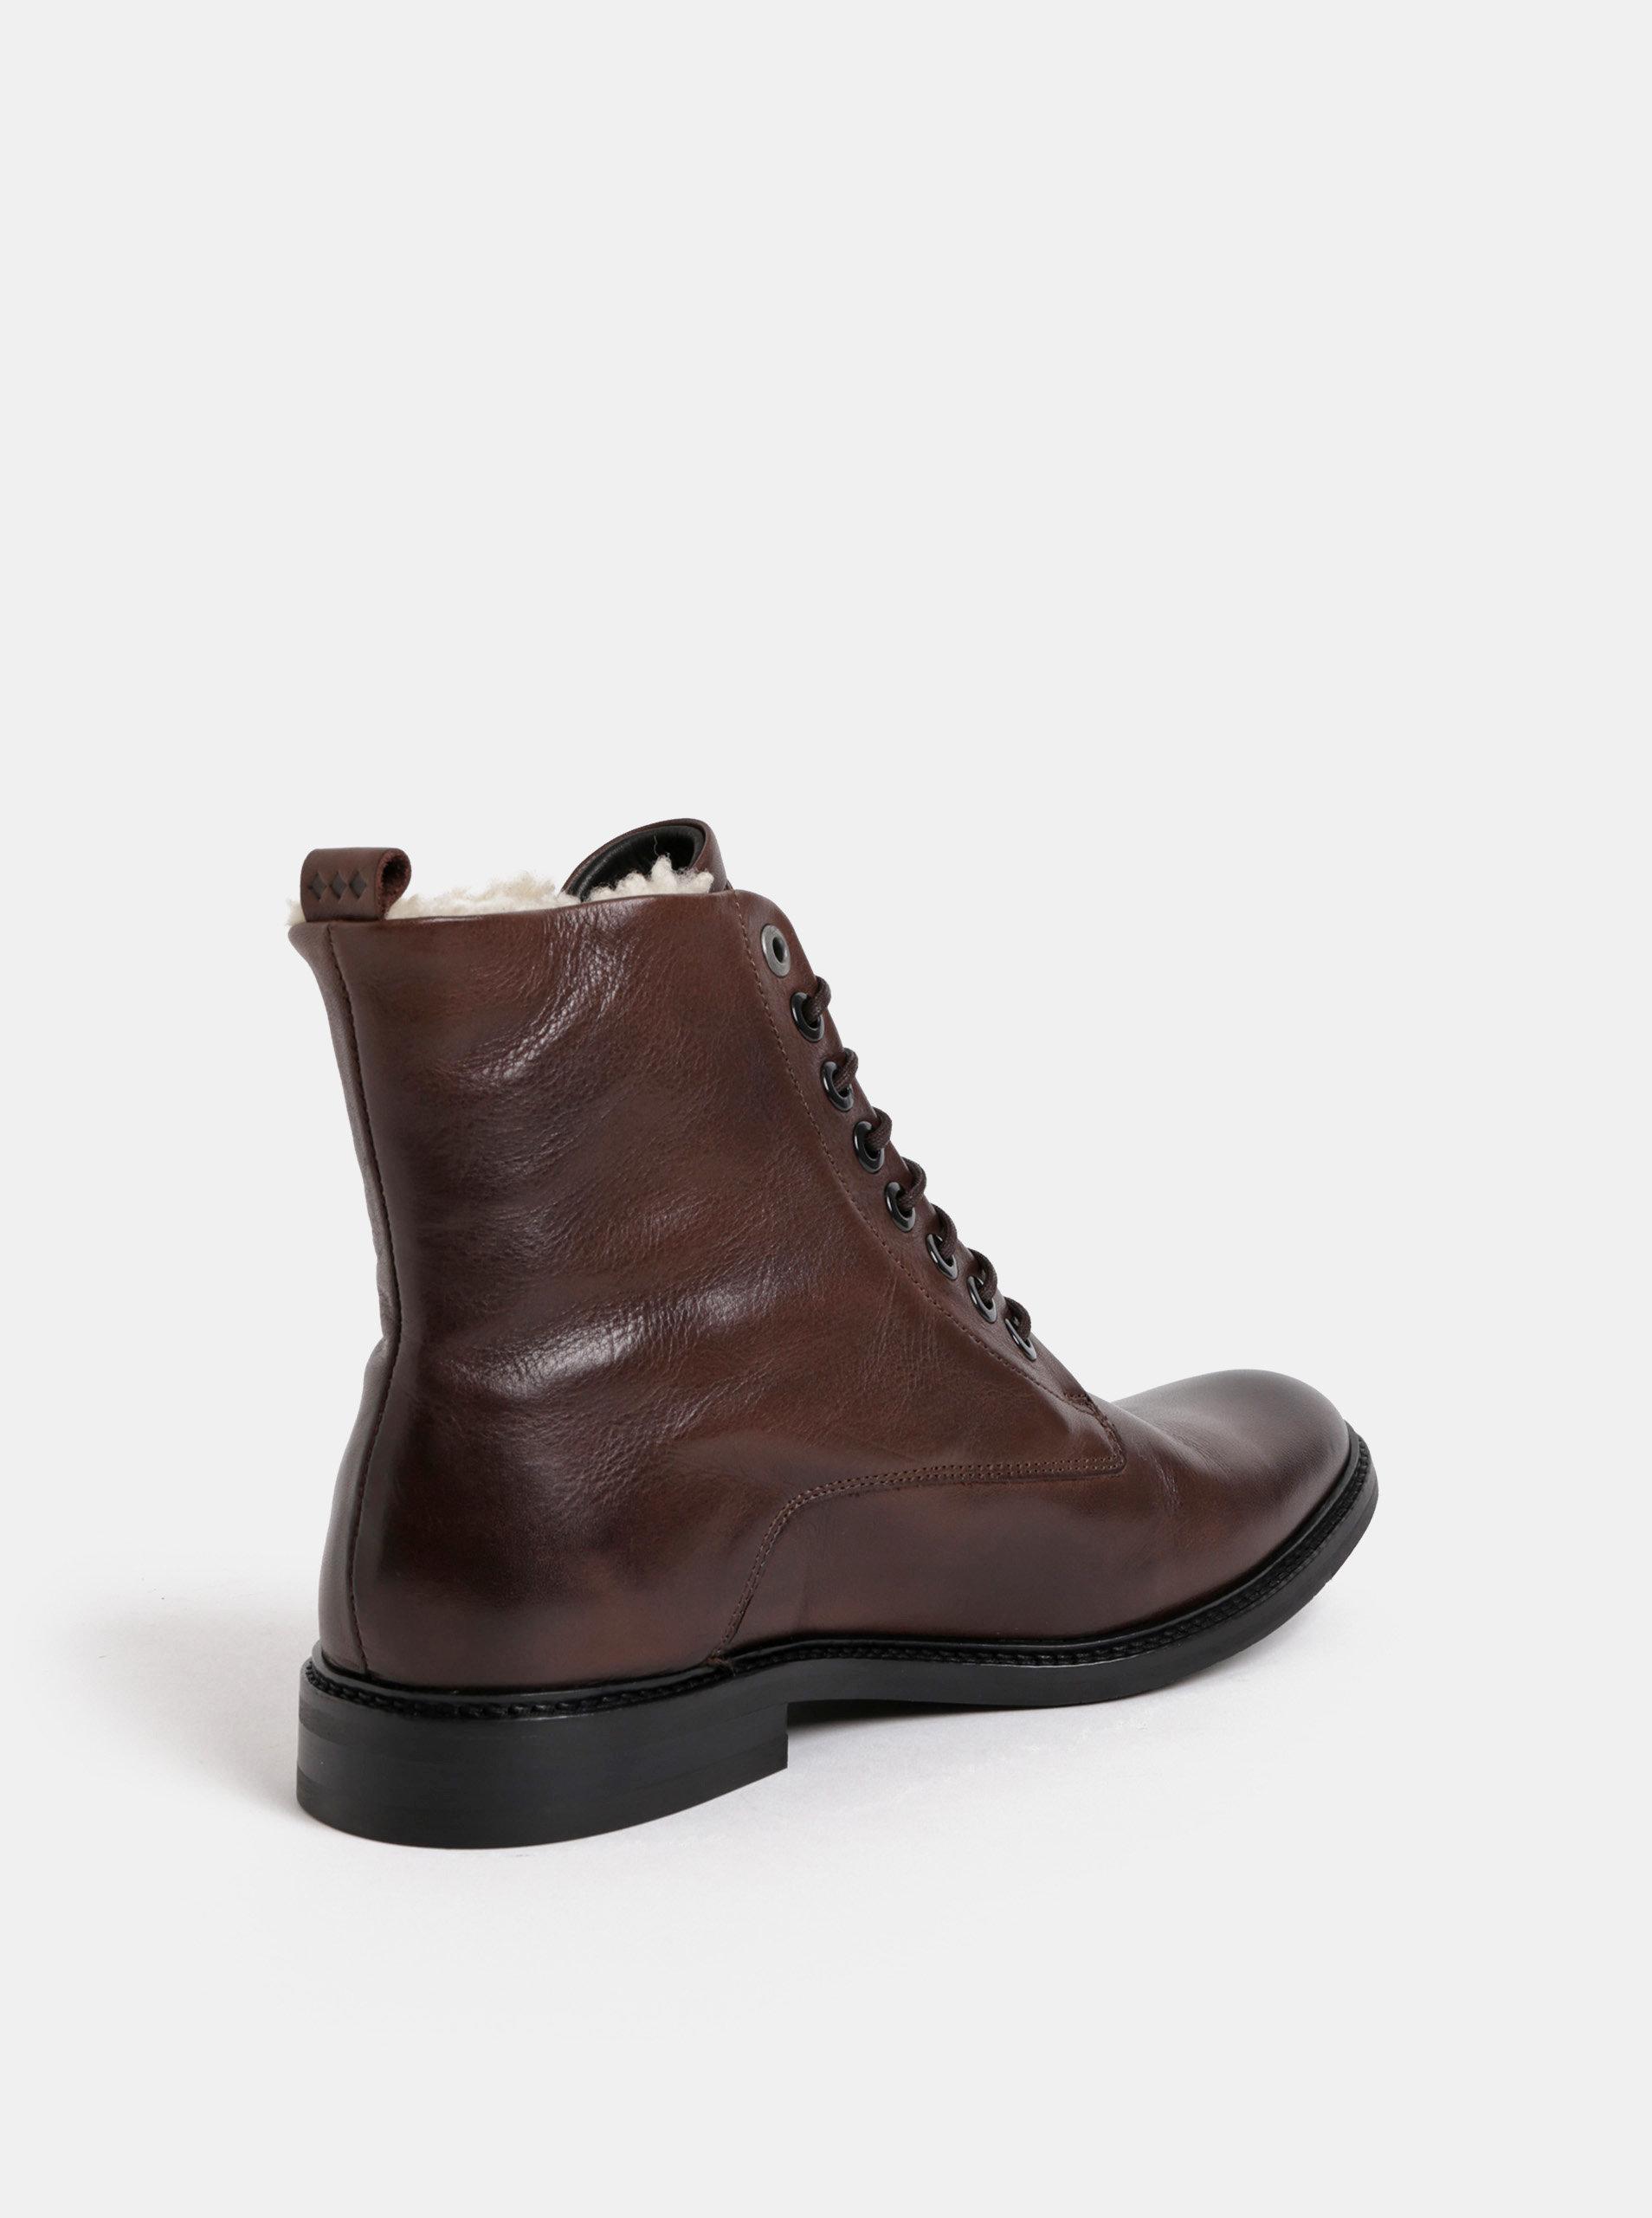 8af421b8191e3 Tmavohnedé pánske kožené členkové zimné topánky Royal RepubliQ ...